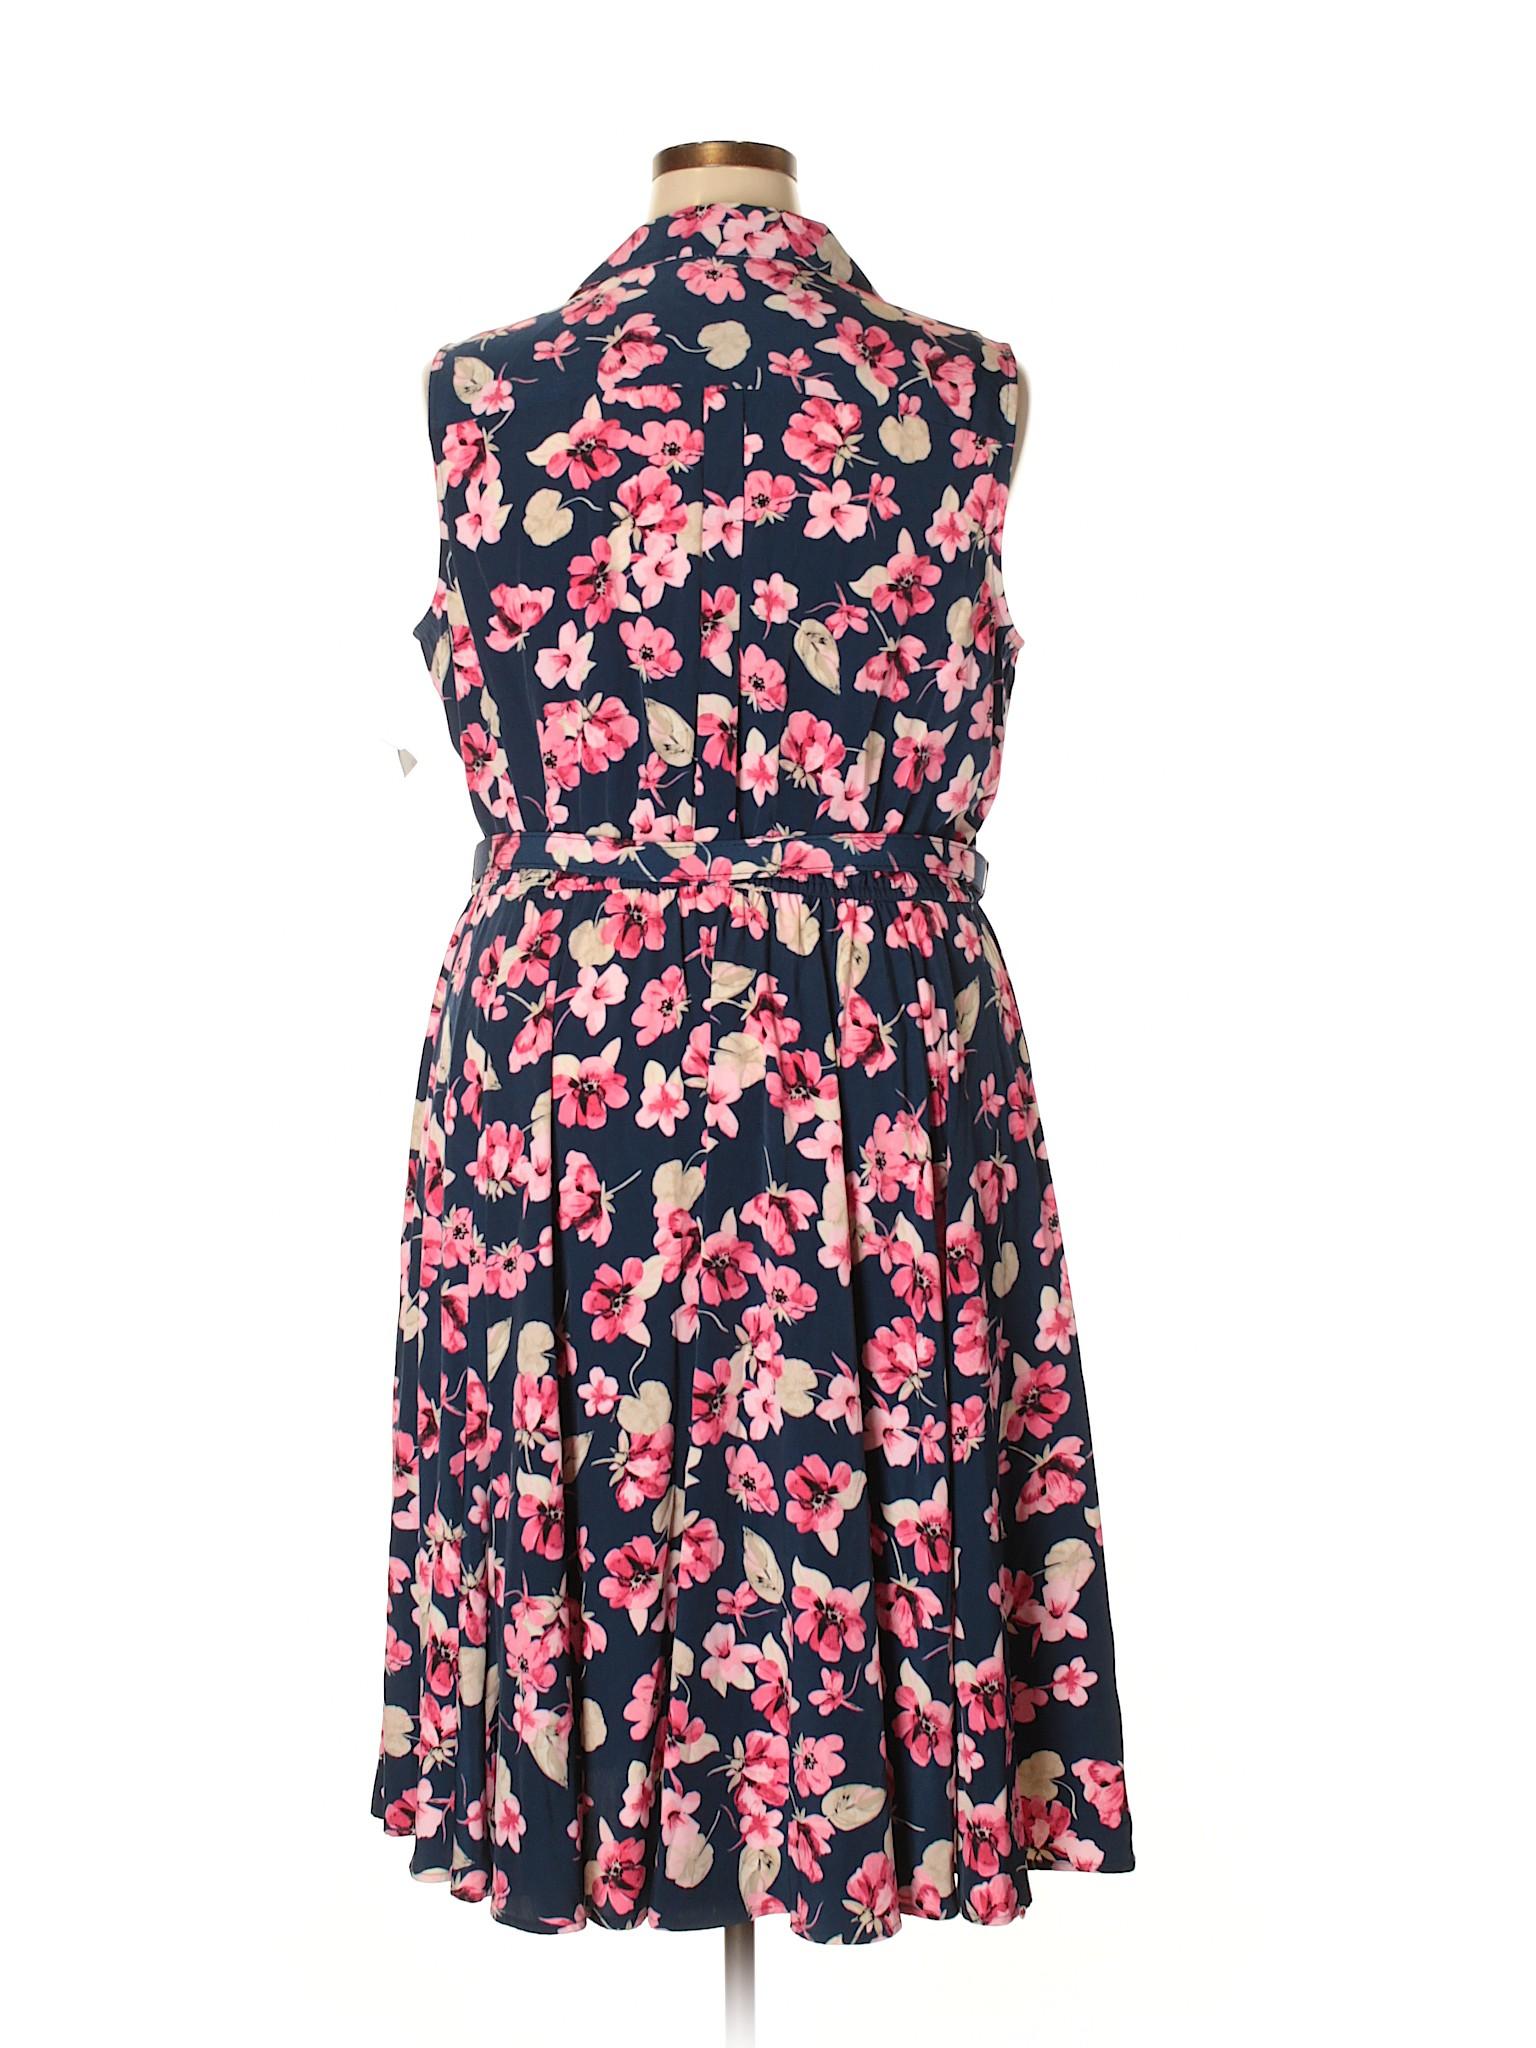 Charter winter Casual Boutique Dress Club T0qXO